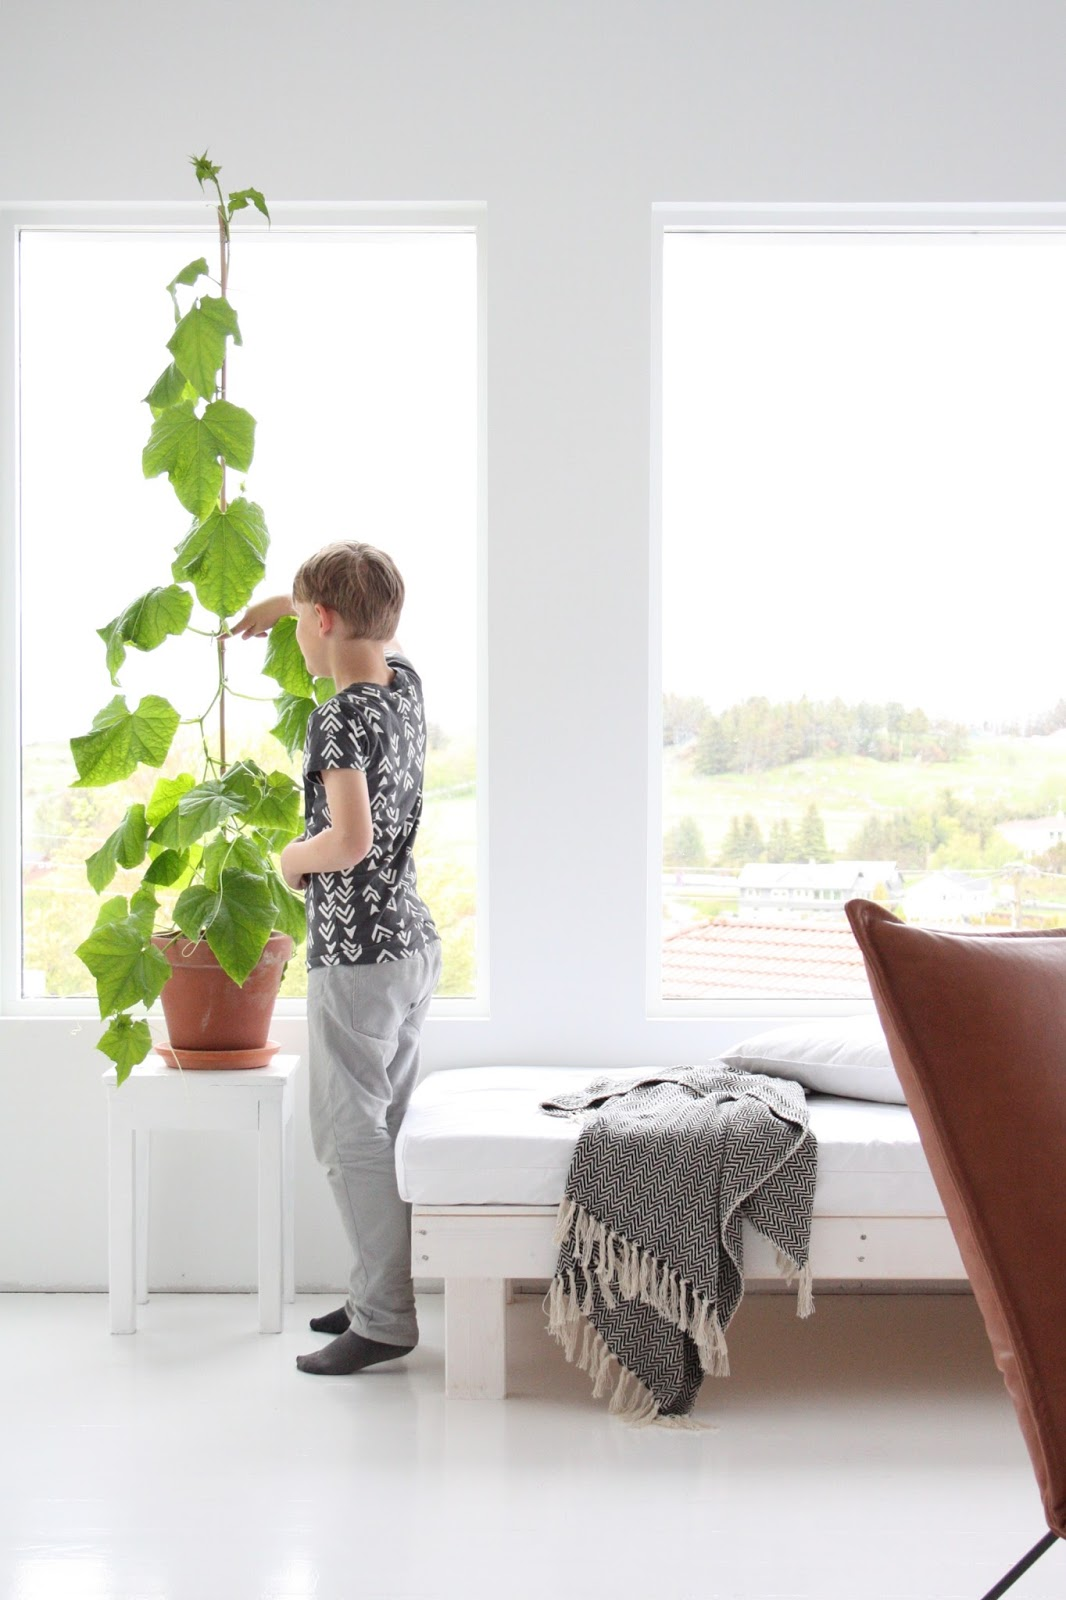 Agurkplante inne